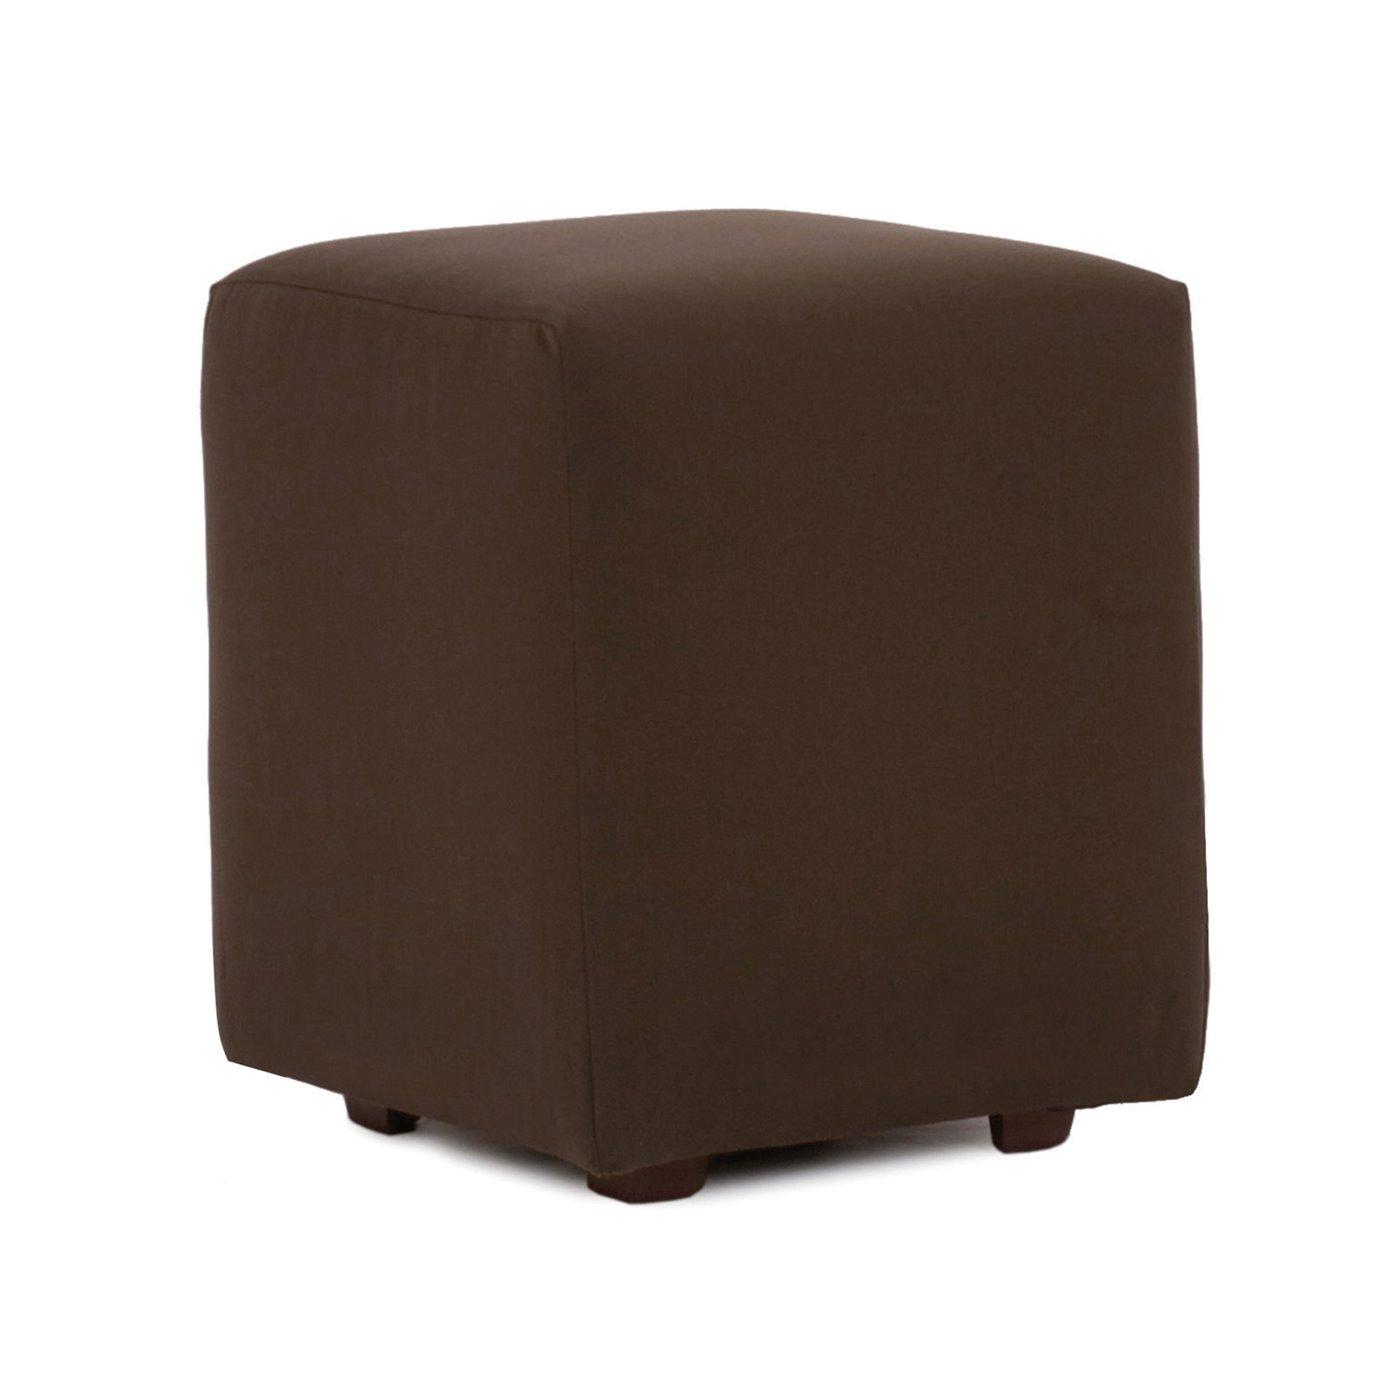 Howard Elliott Universal Cube Outdoor Sunbrella Seascape Chocolate Complete Ottoman